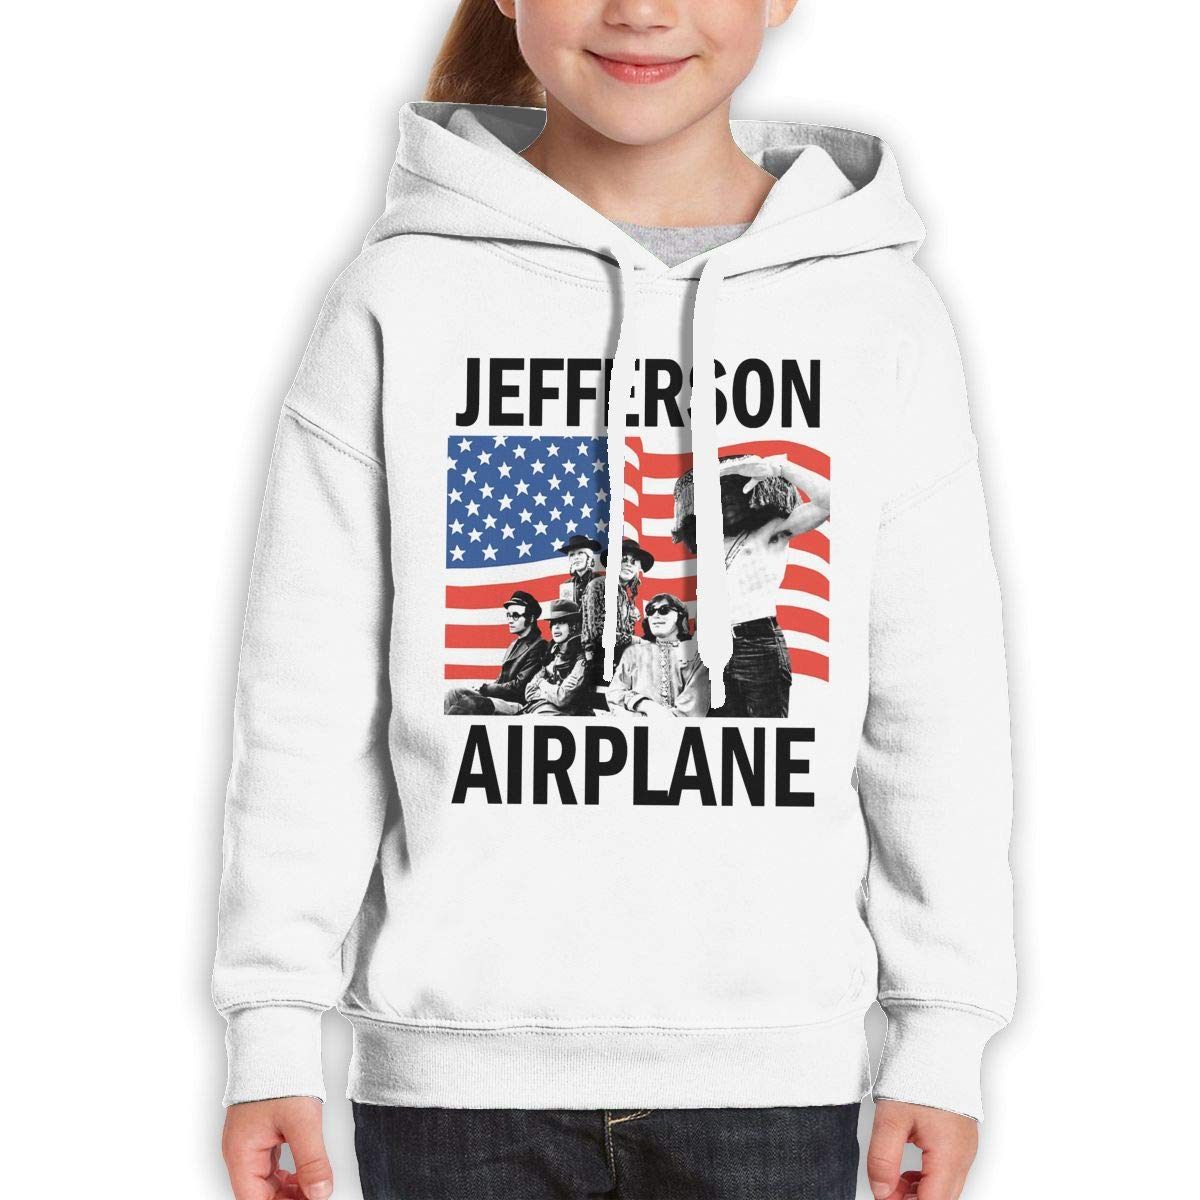 Guiping Jefferson Airplane Teen Hooded Sweate Sweatshirt White